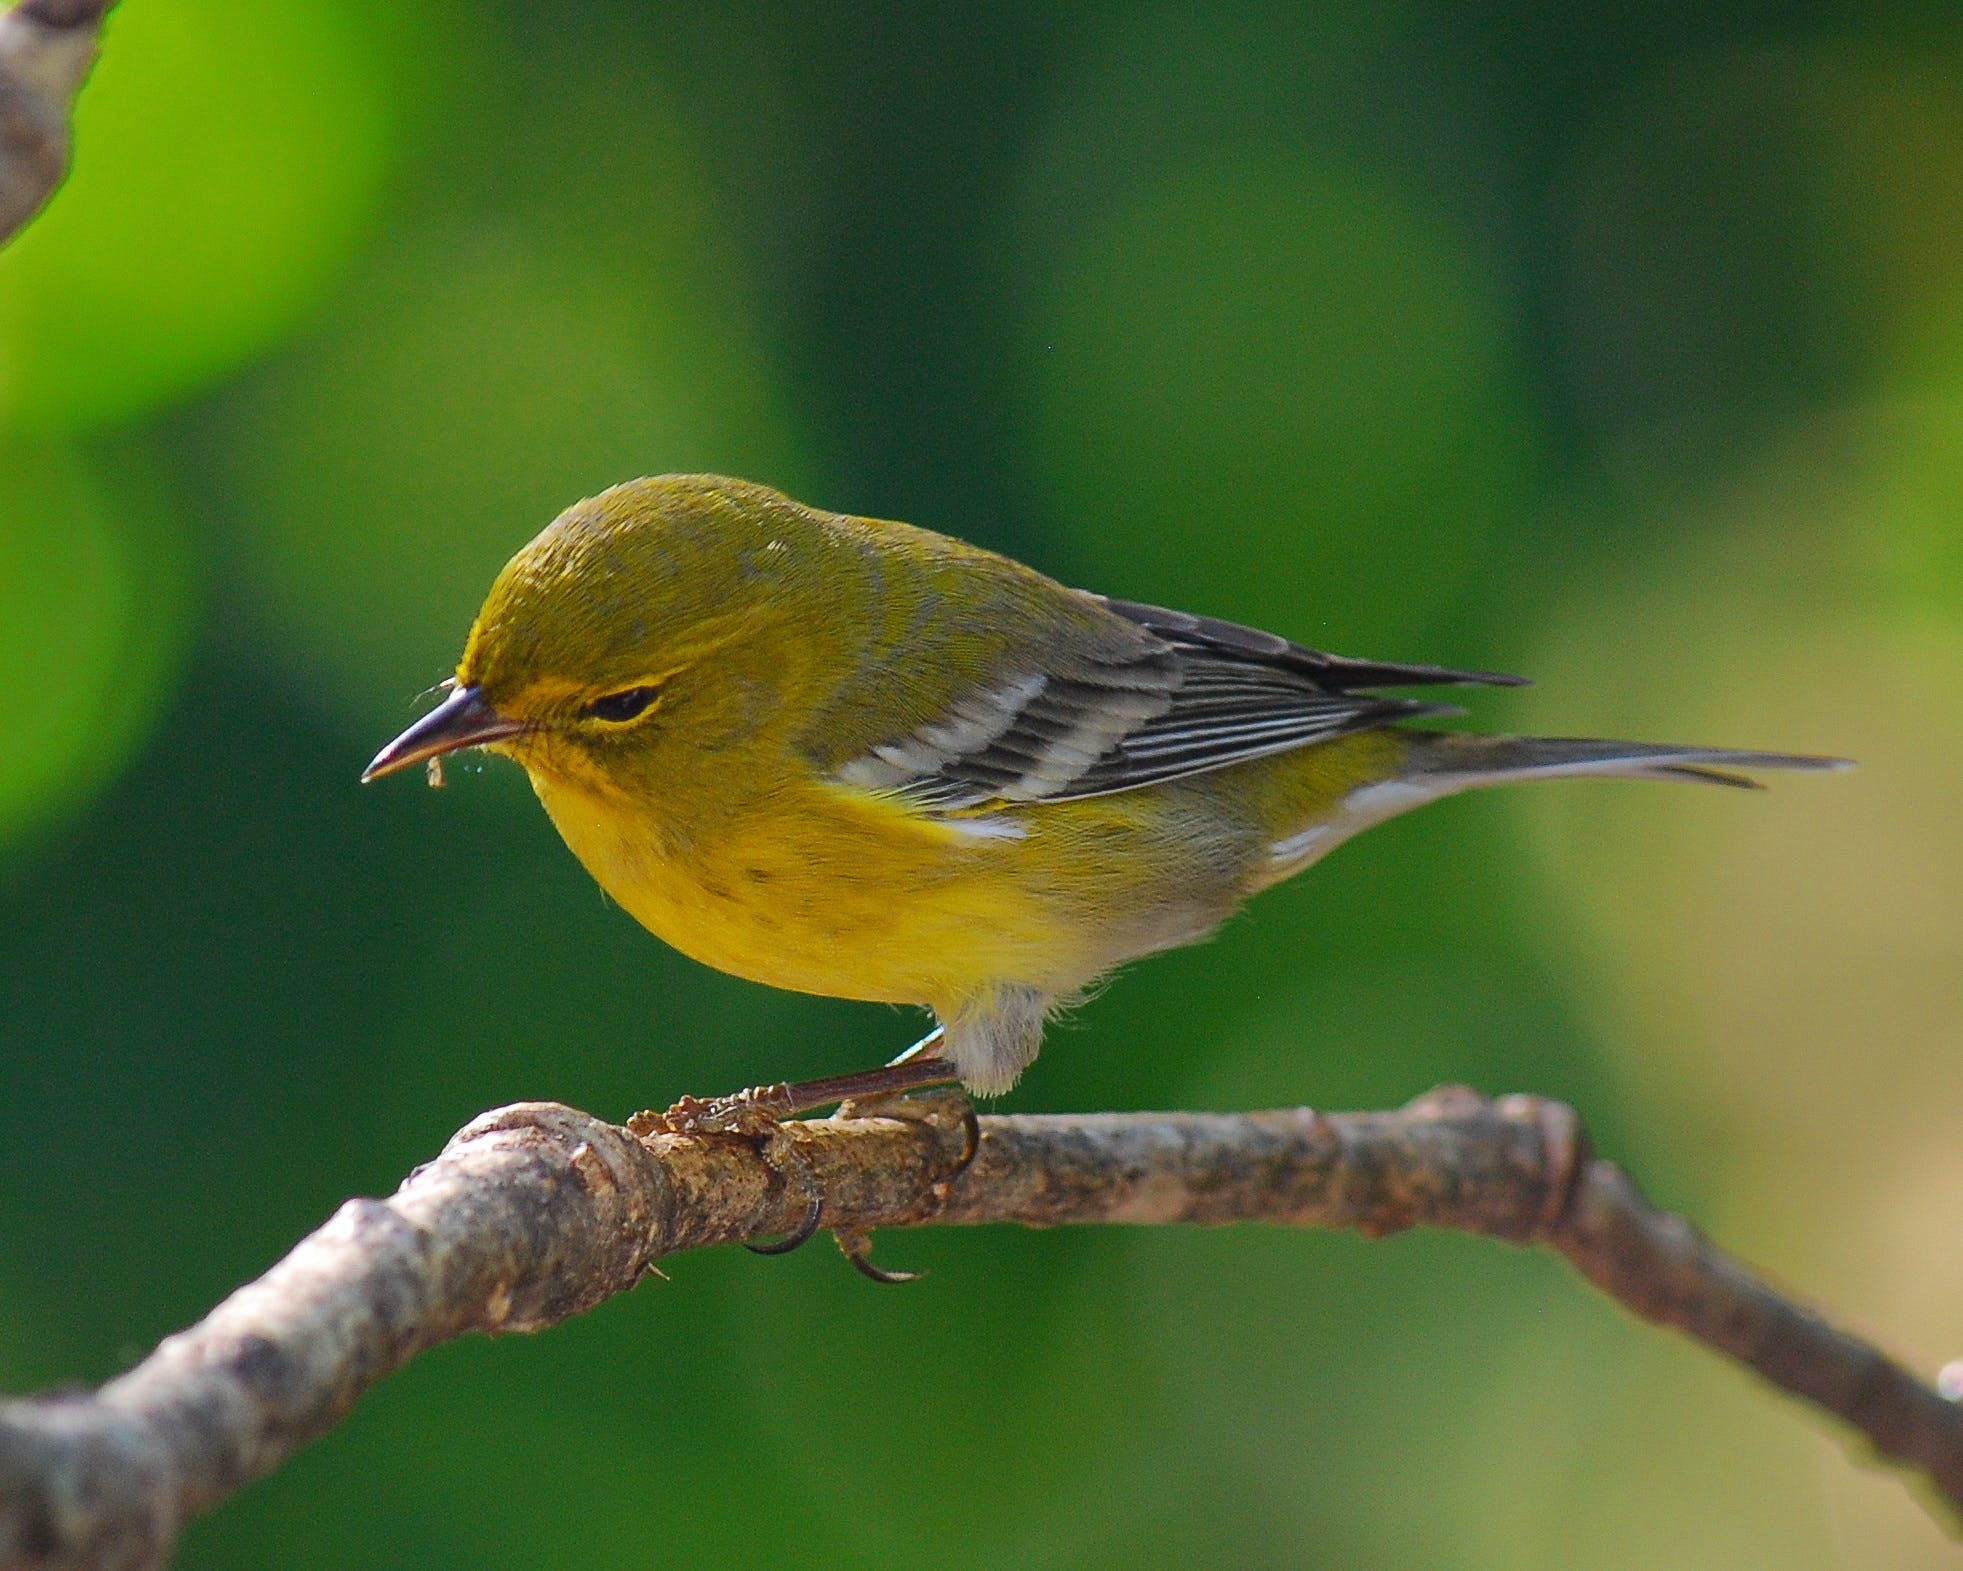 Free stock photo of bird, nature, outdoors, perching